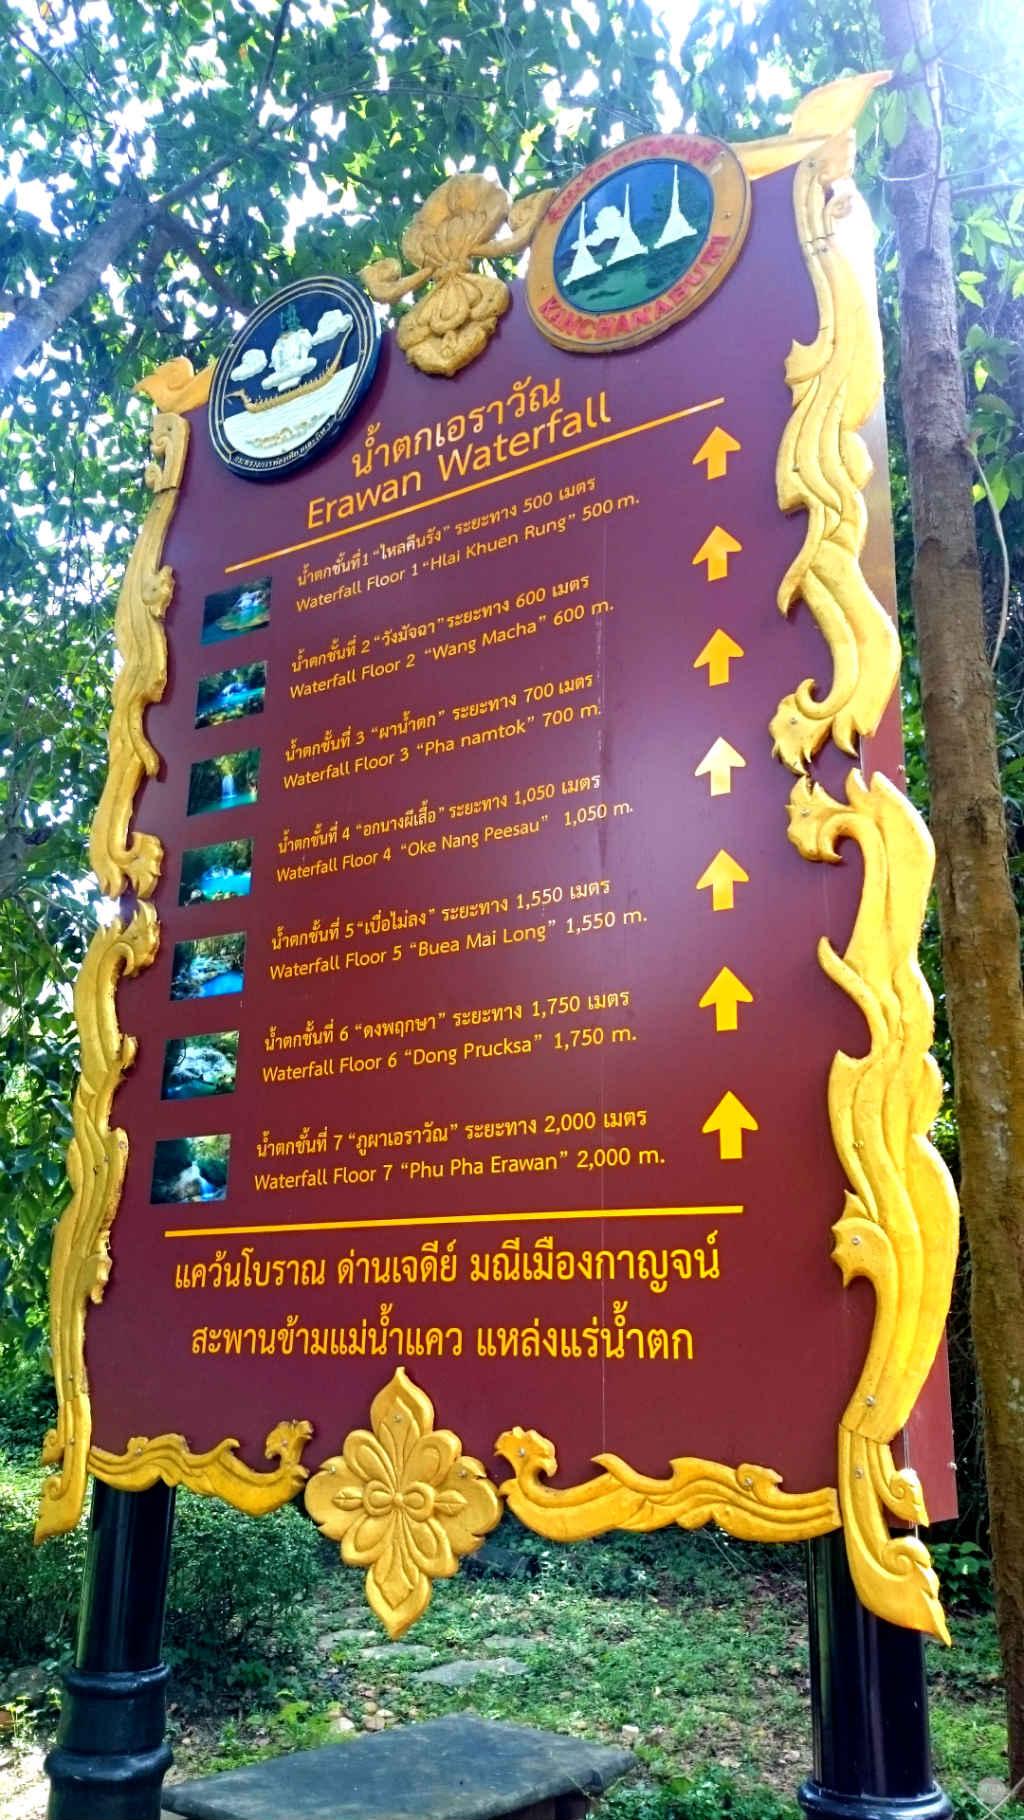 Thailand Kanchanaburi Placa Erawan Waterfall Vida de Tsuge VDT 1024x1820